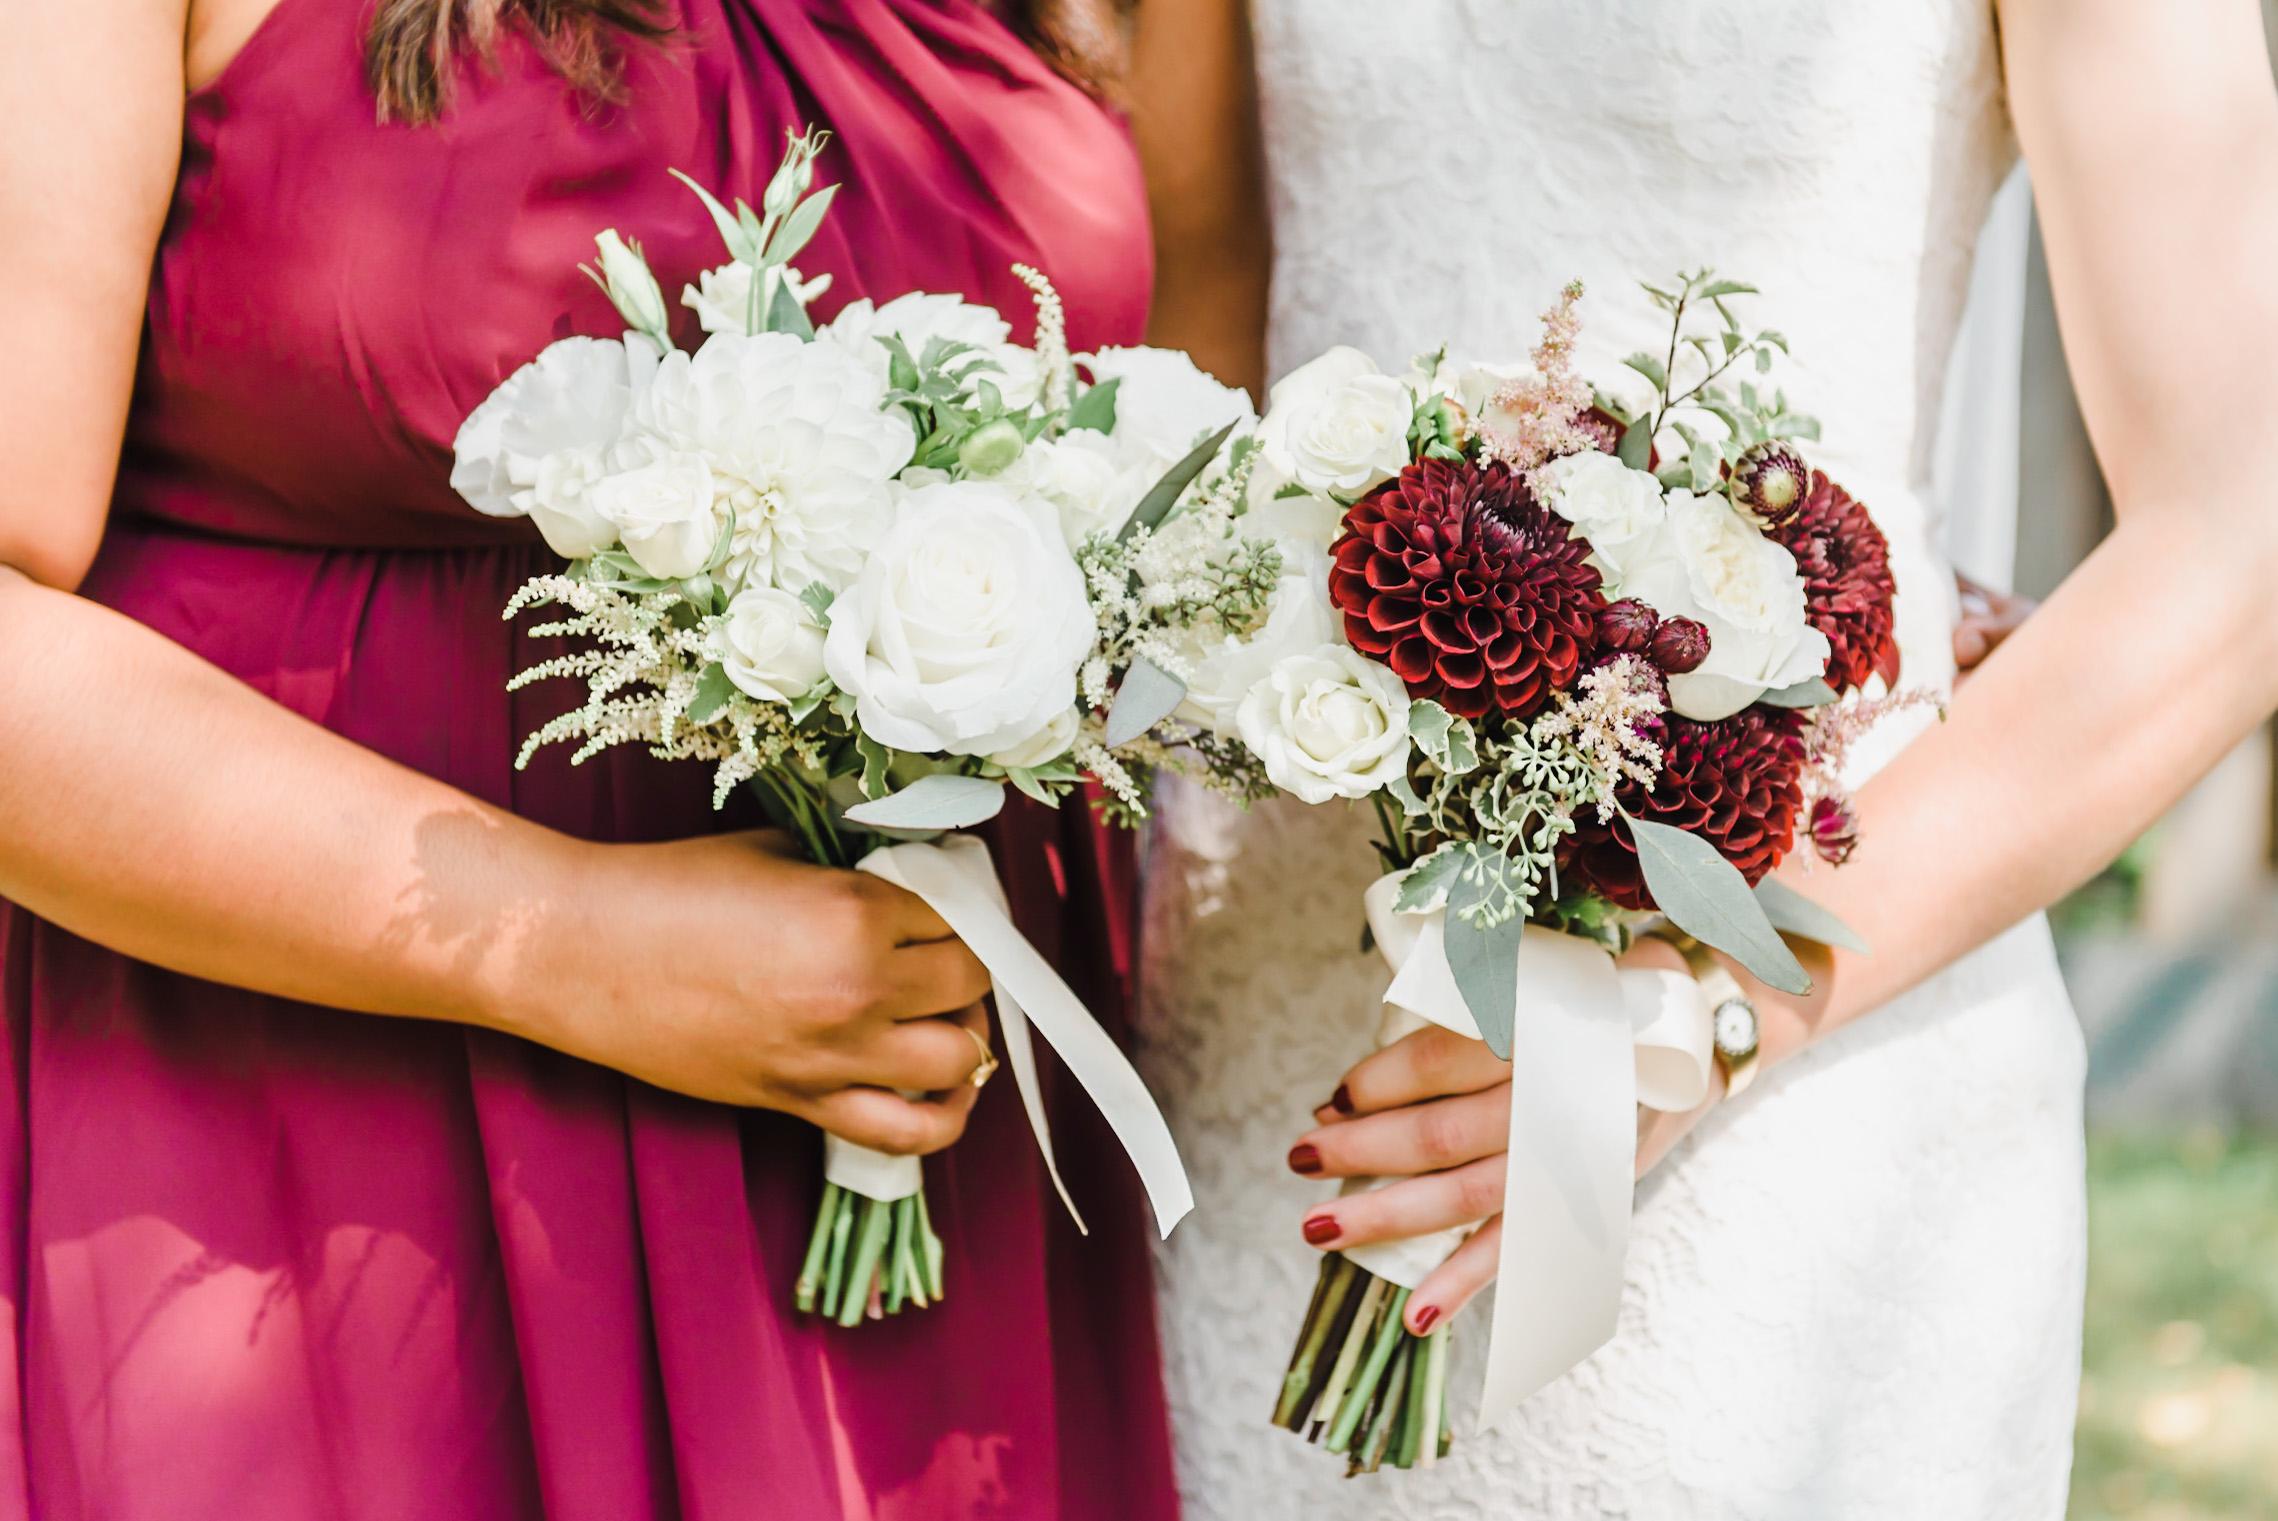 Ottawa Organic Garden-Inspired Wedding Bouquet  | Ottawa Light and Airy Wedding Photographer-47.jpg